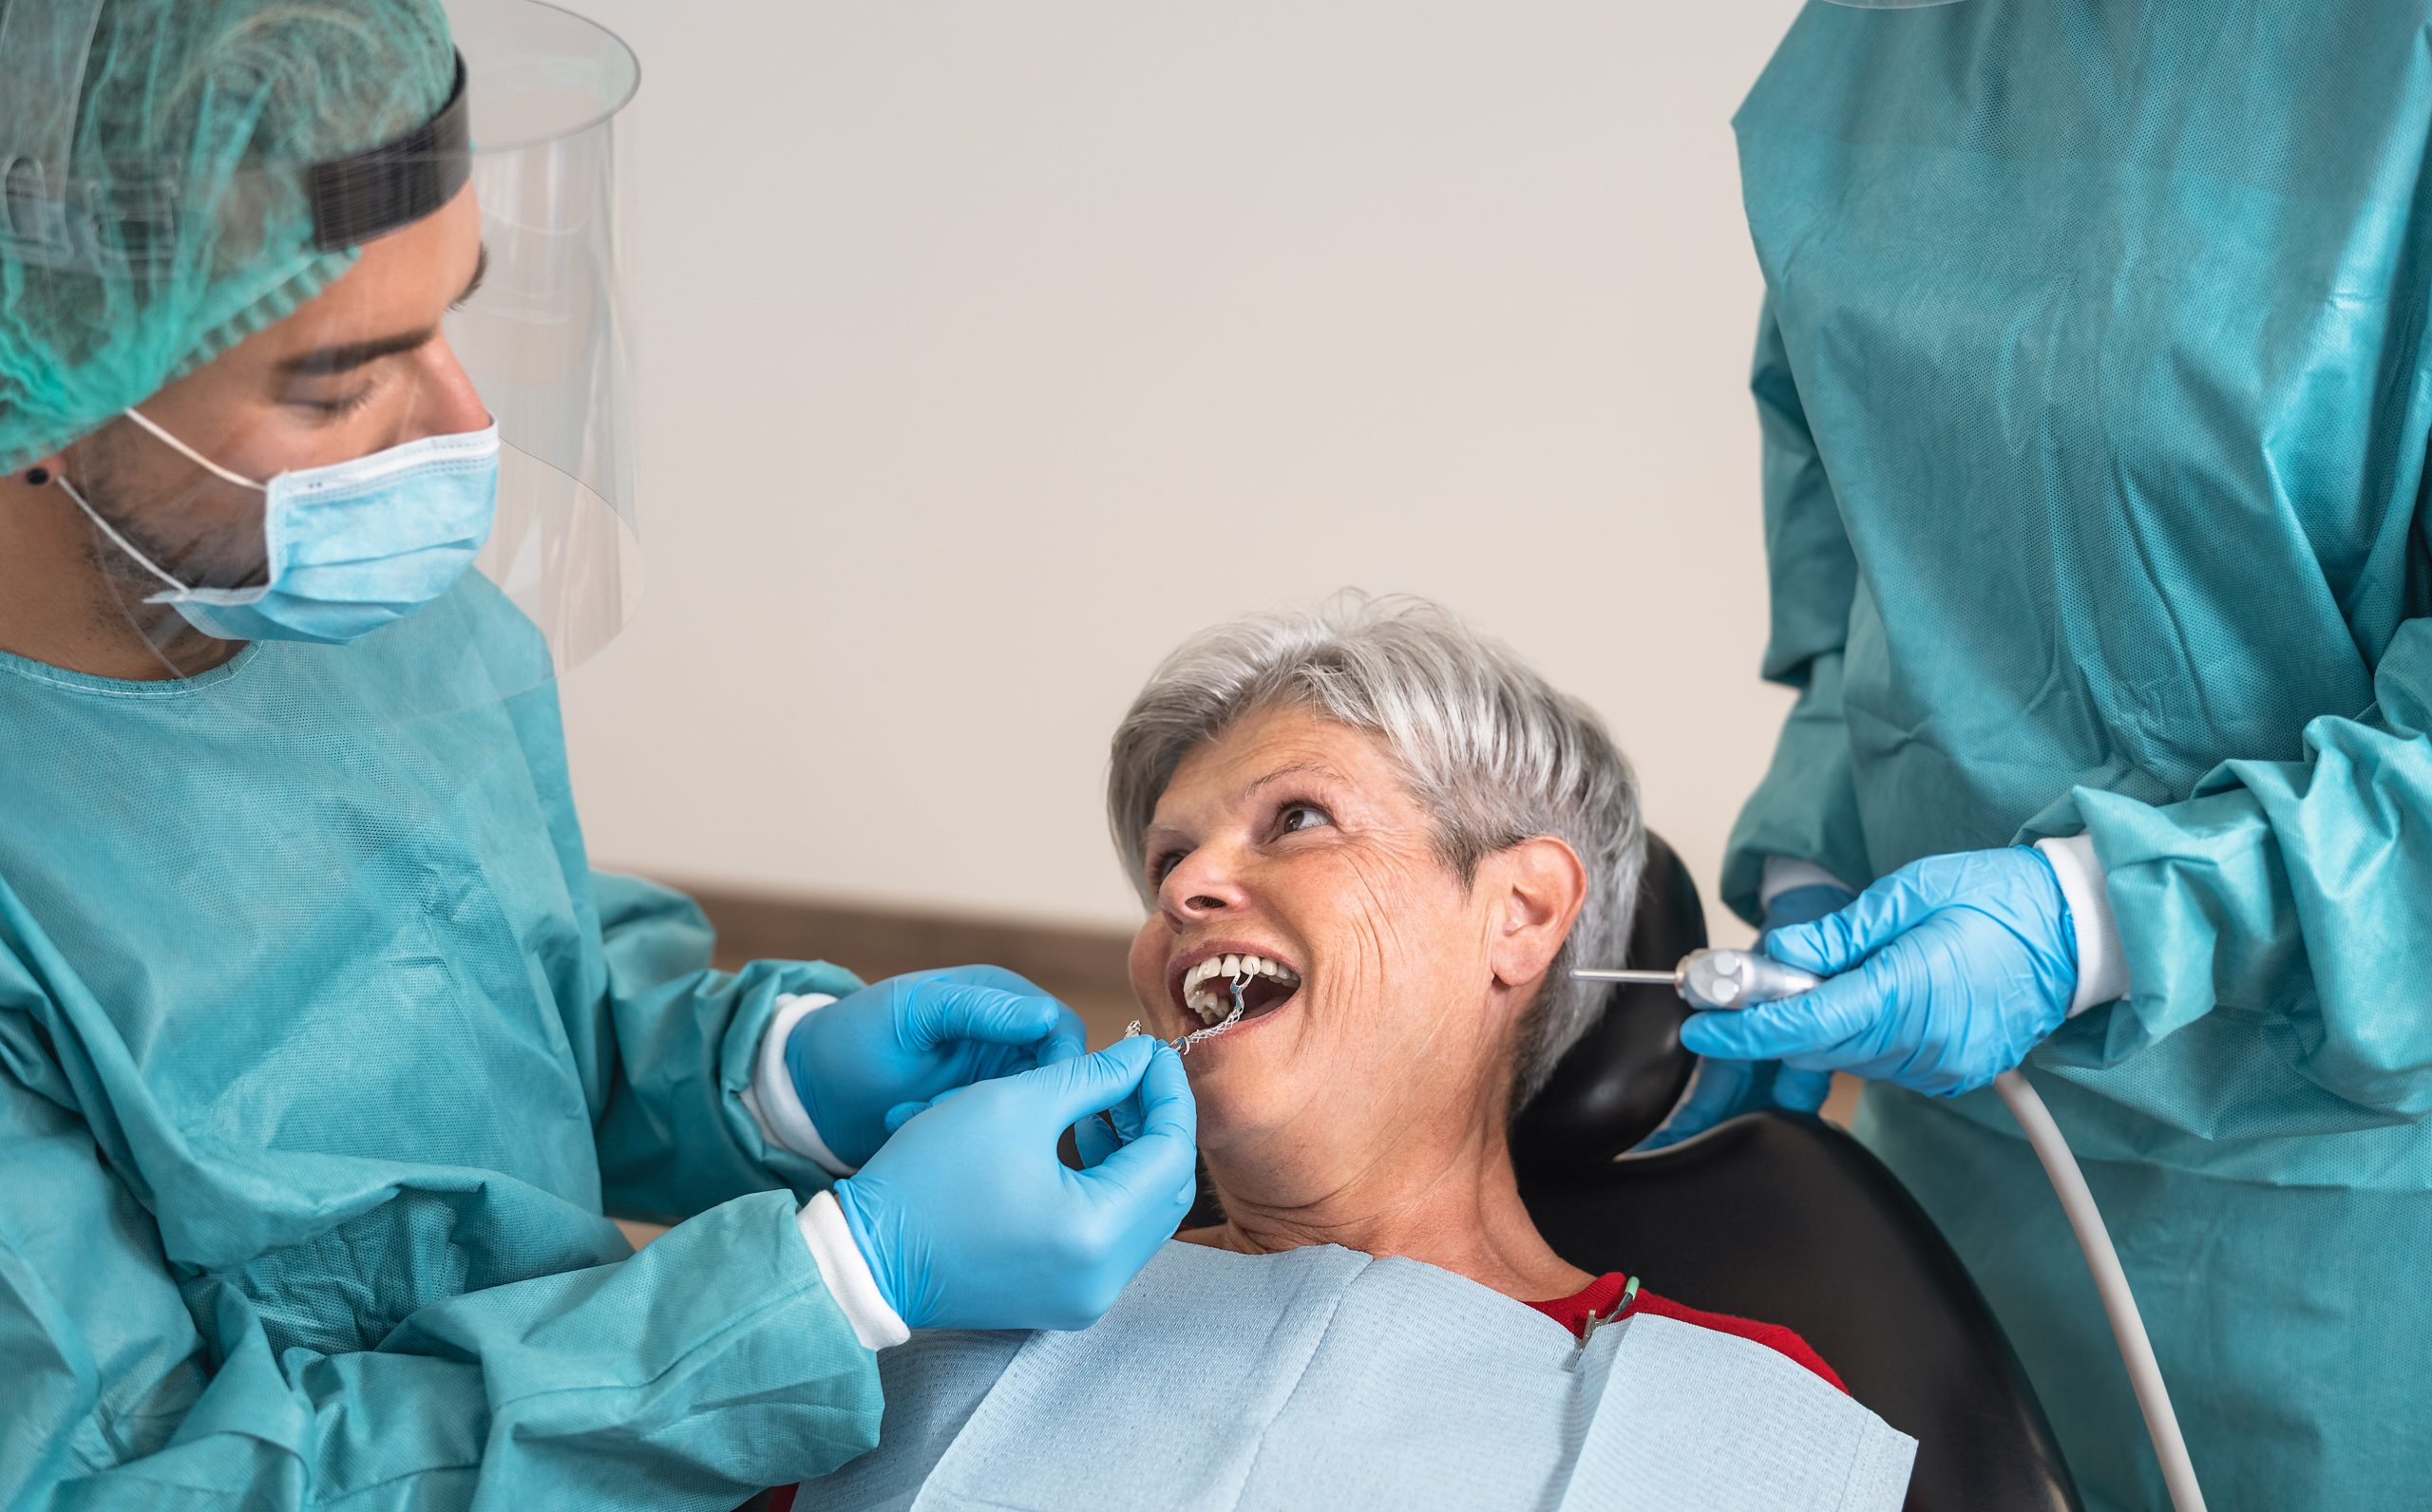 odontologia-biosseguranca